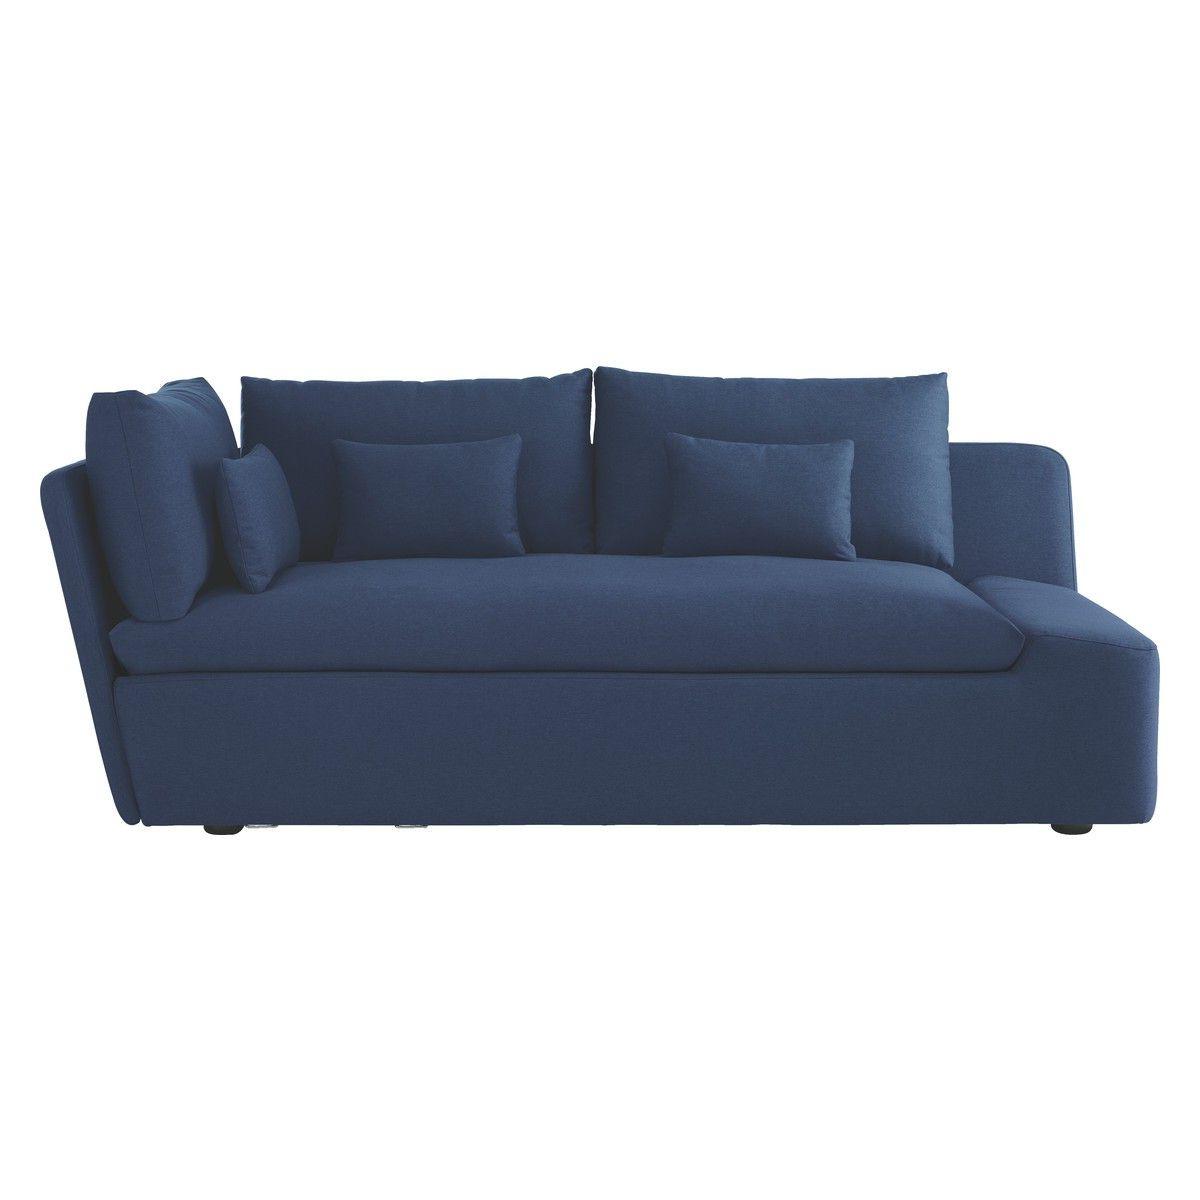 Seater Sofa, Blue Sofa (View 10 of 20)